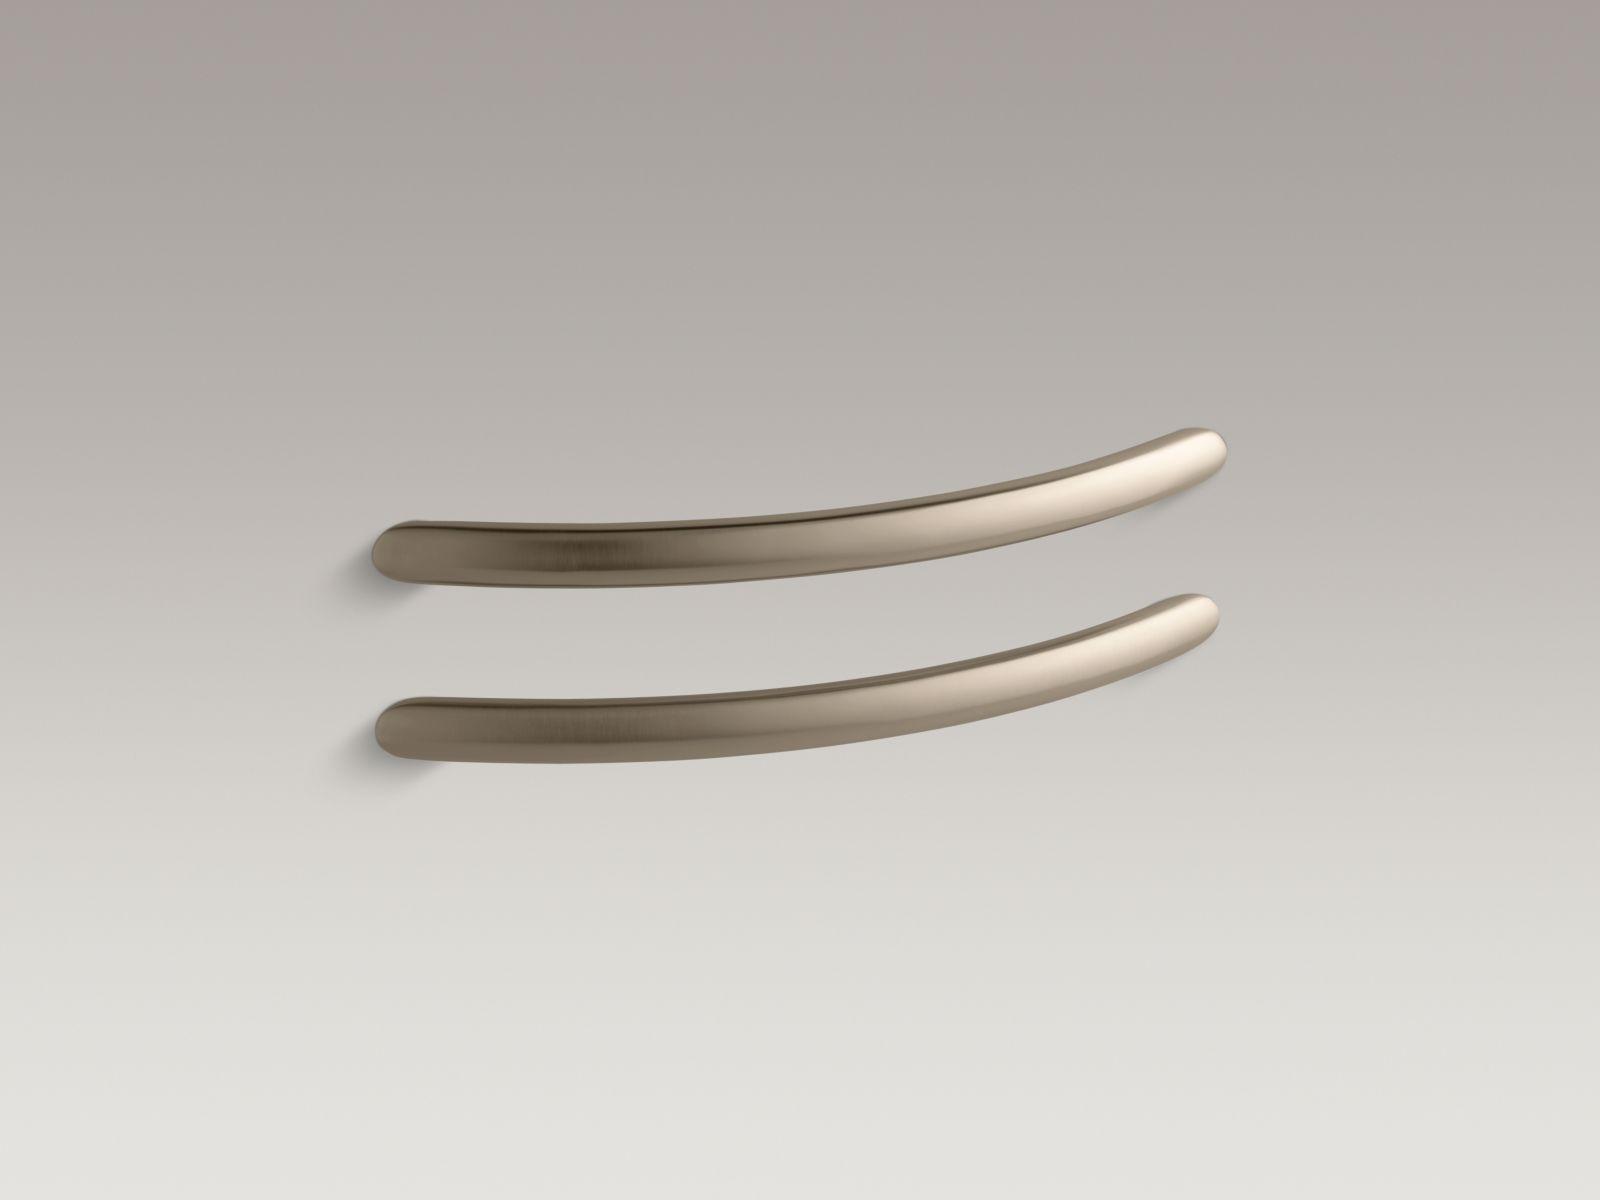 Kohler K-9669-BV RiverBath Grip Rails Vibrant Brushed Bronze